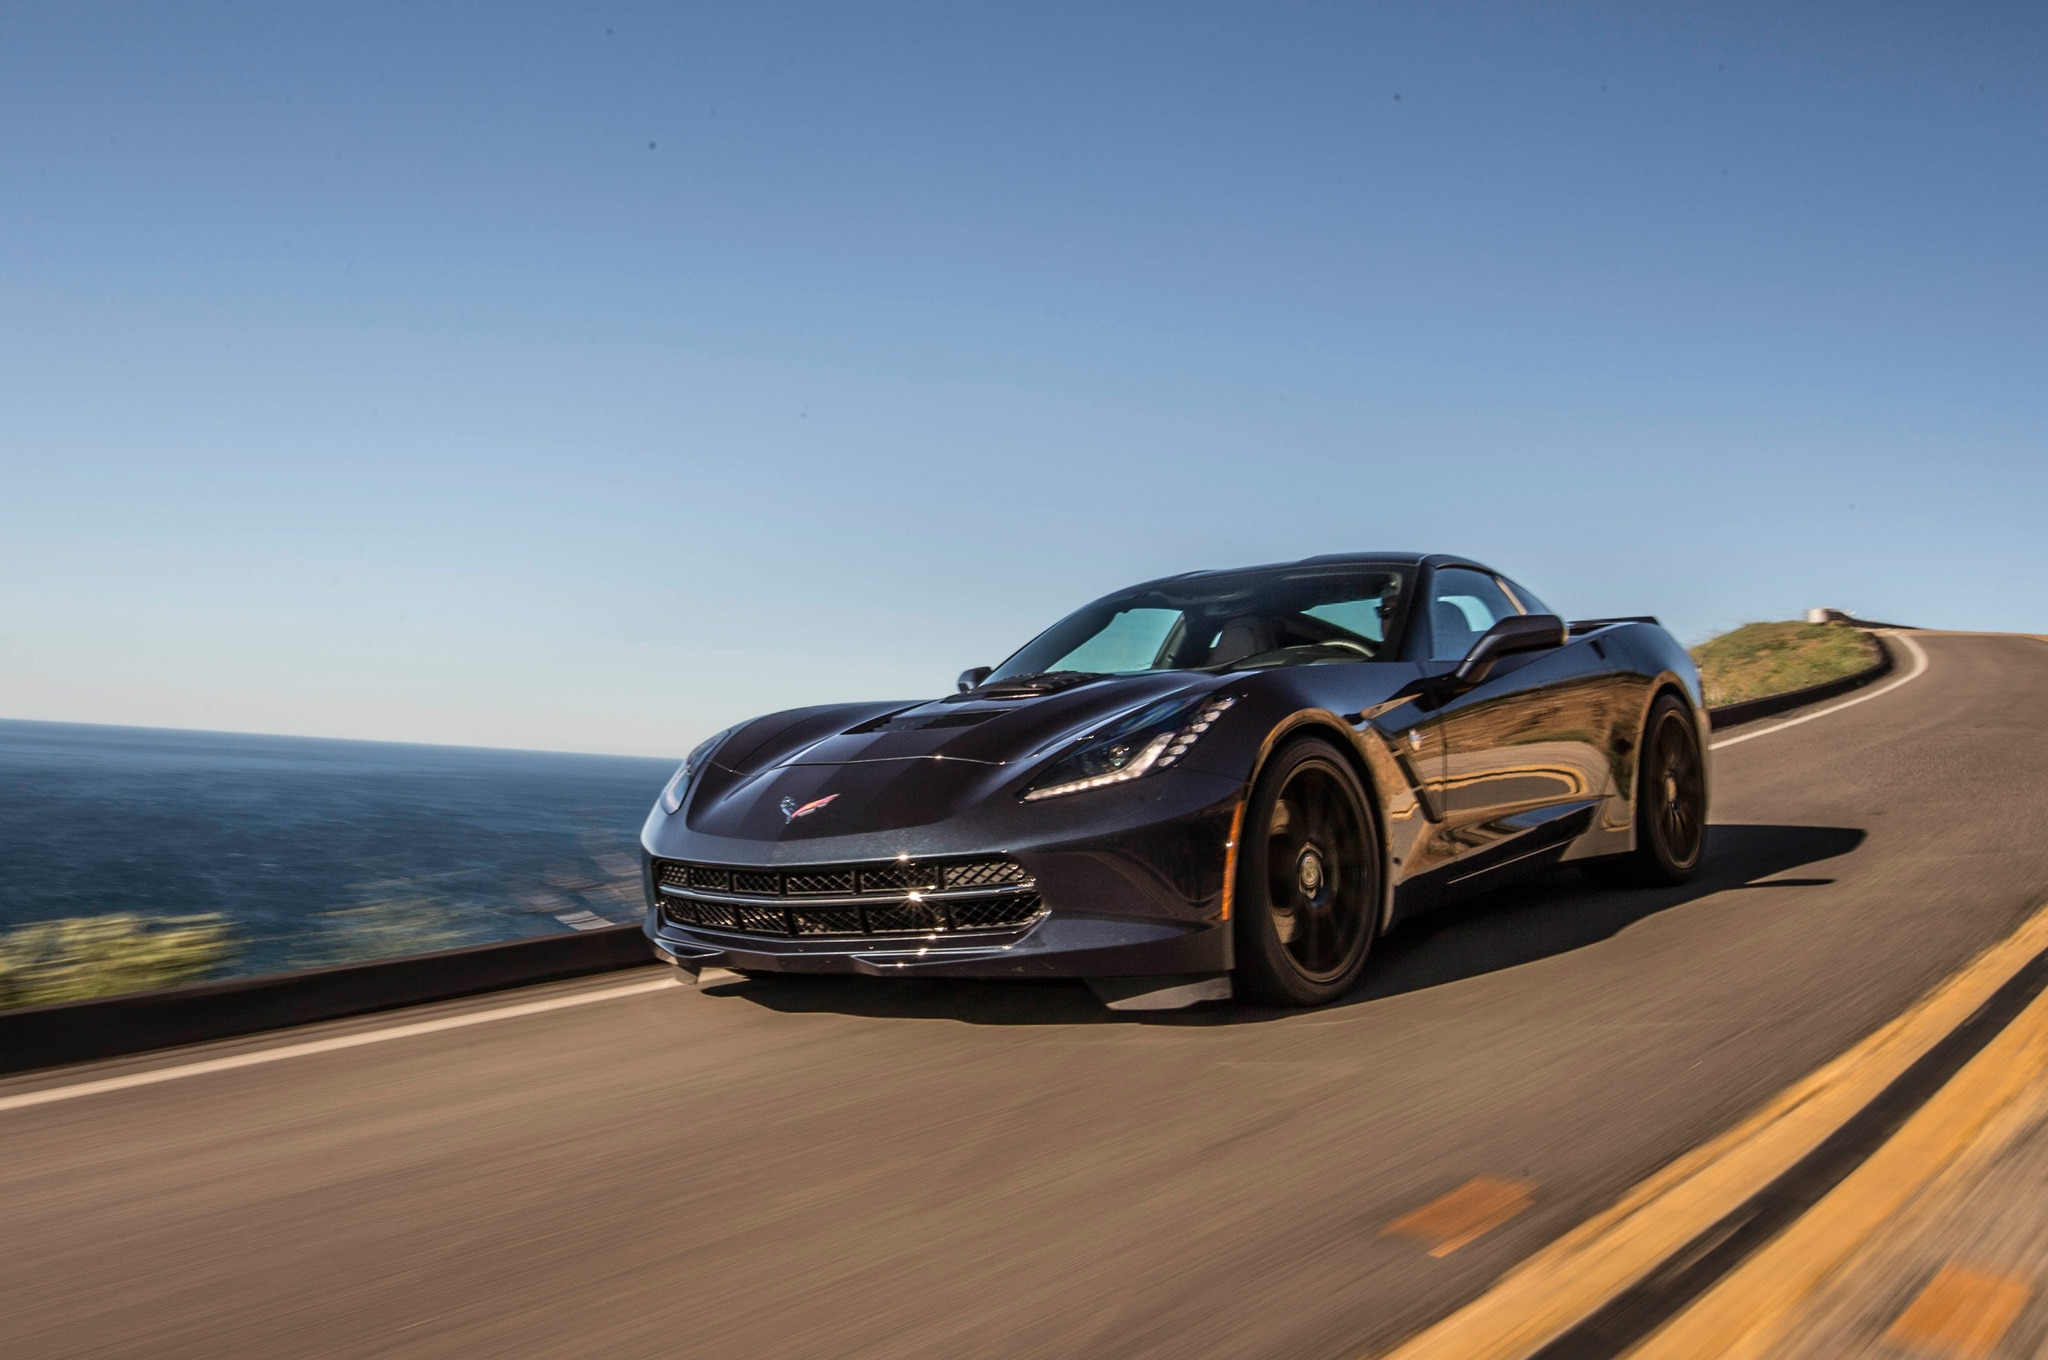 8c6731958403d 2015 Callaway Corvette SC627 Review